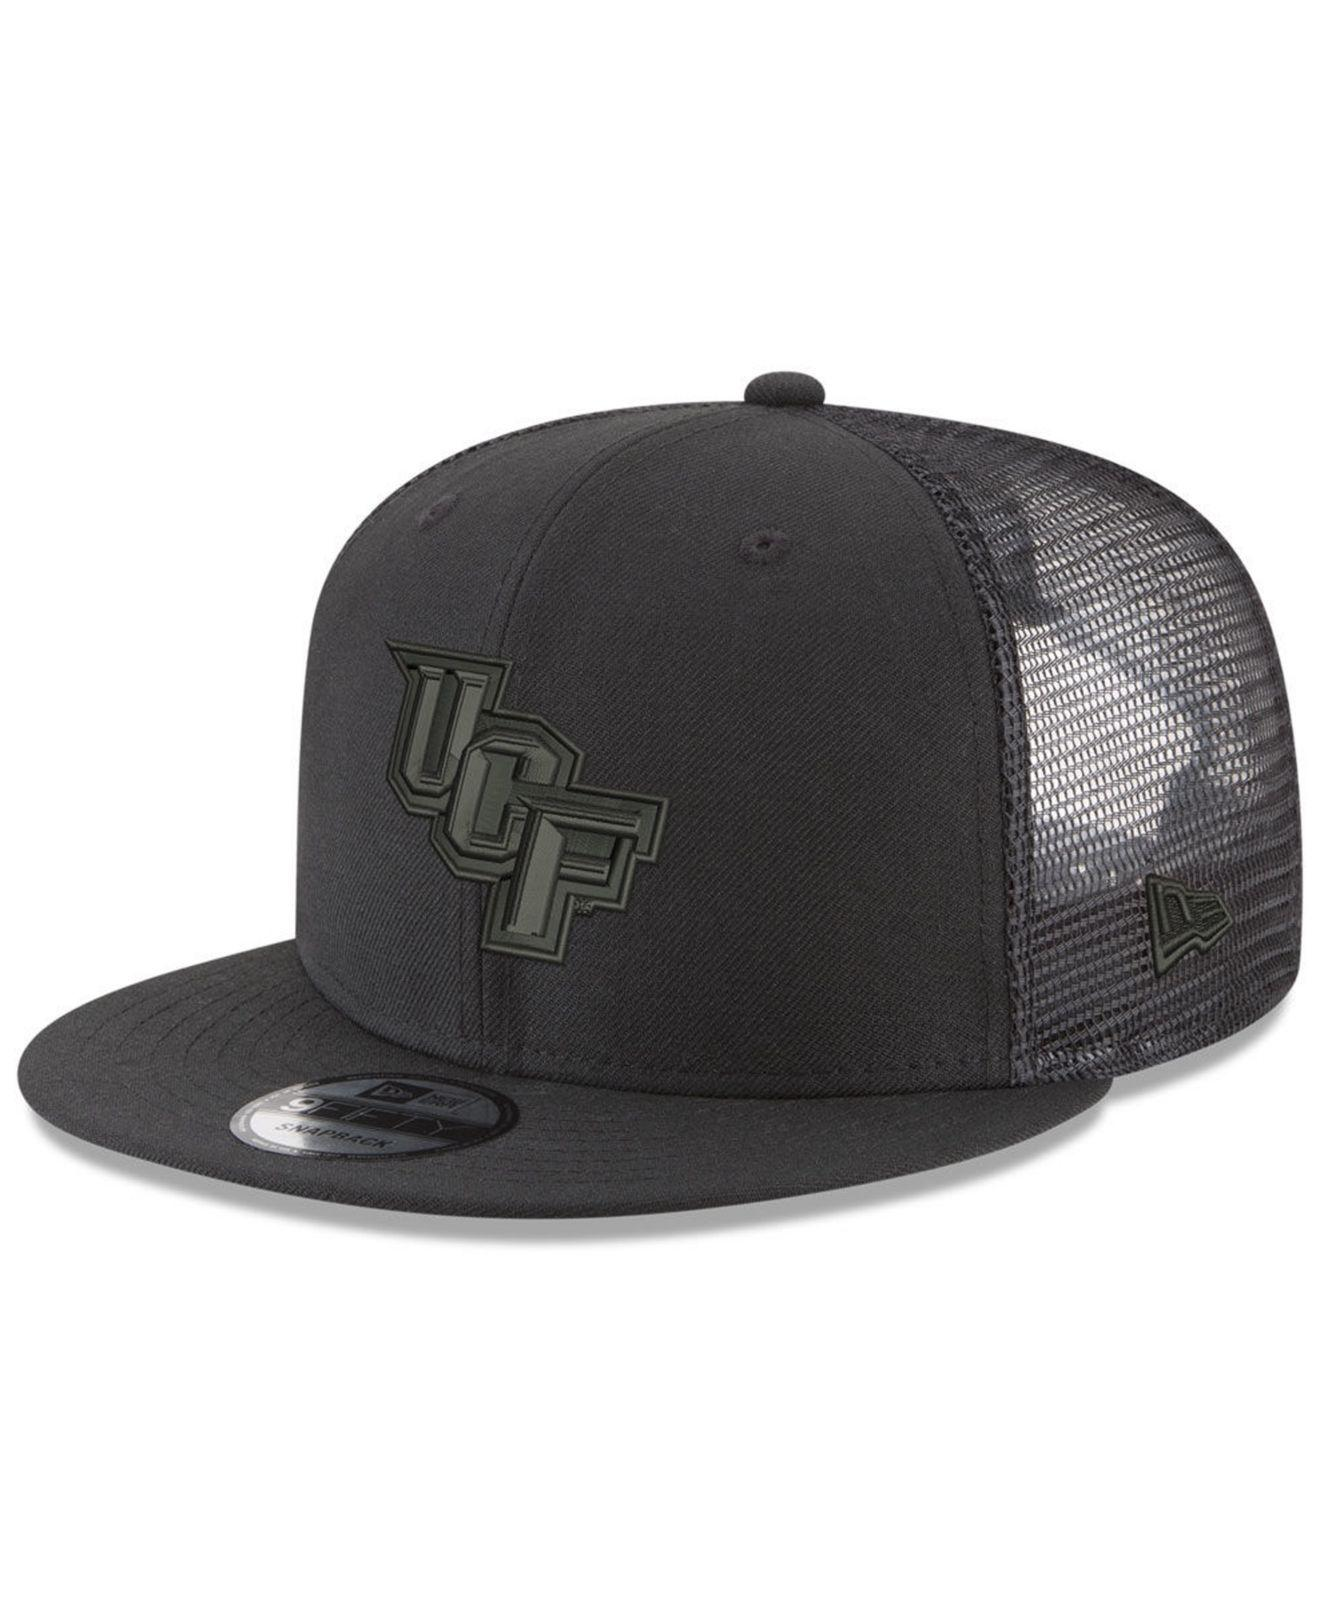 new style 8115e c0d75 KTZ. Men s University Of Central Florida Knights Black On Black Meshback  Snapback Cap